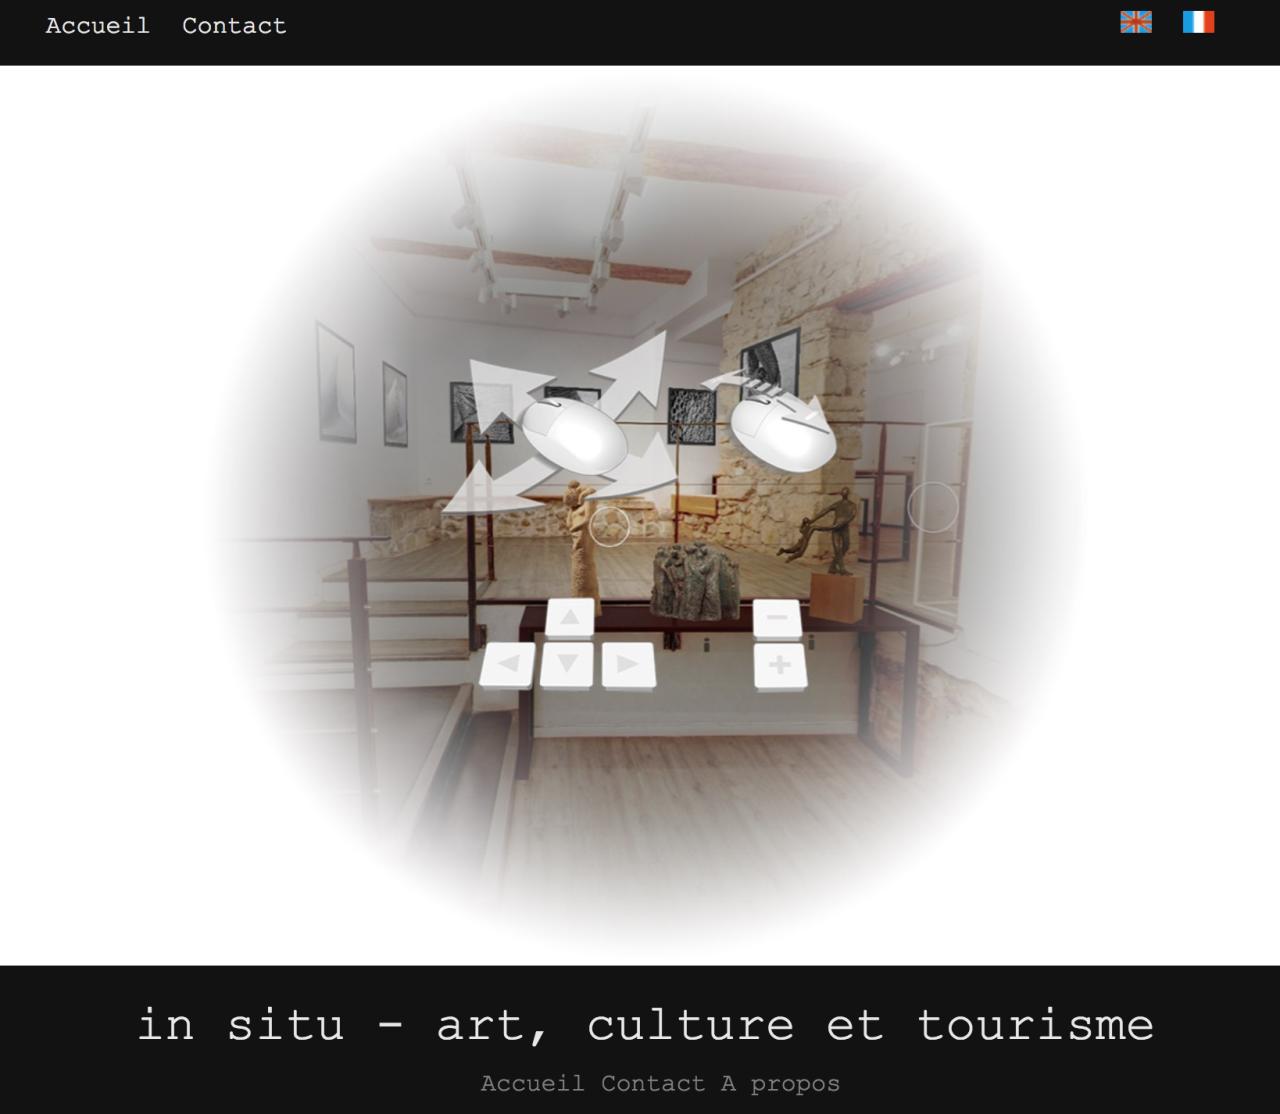 Image def gal virtuelle